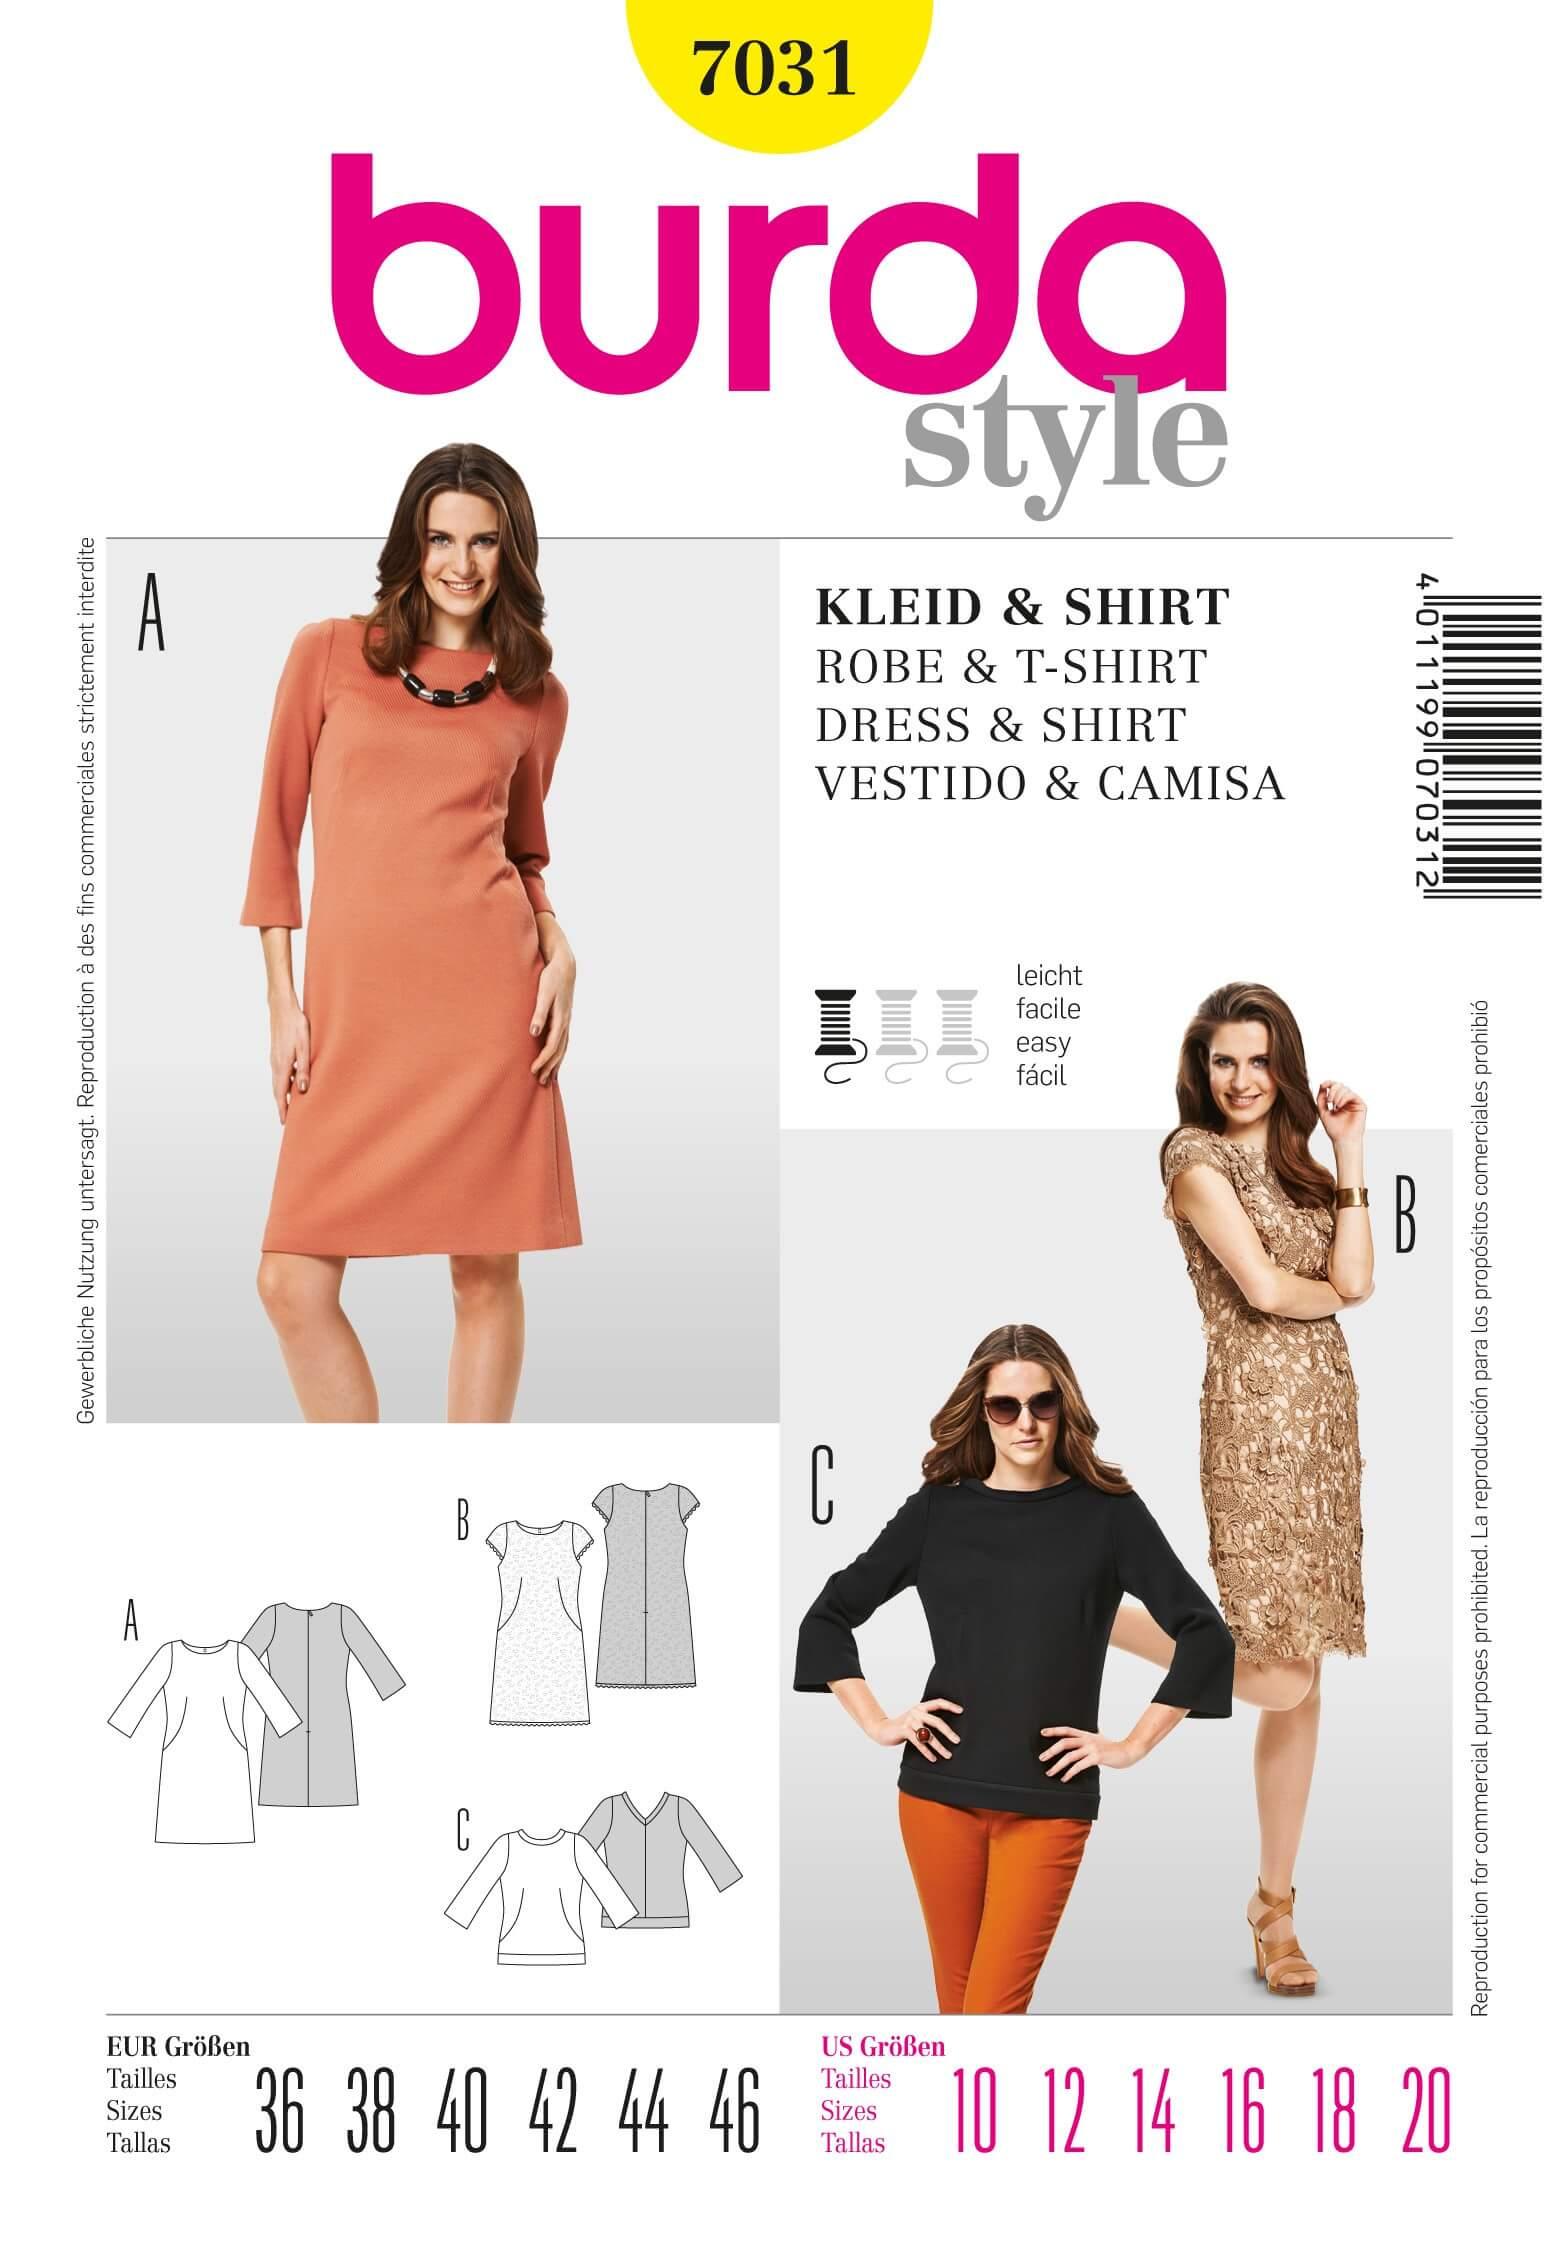 Burda Style Dress & Top Fabric Sewing Pattern 7131